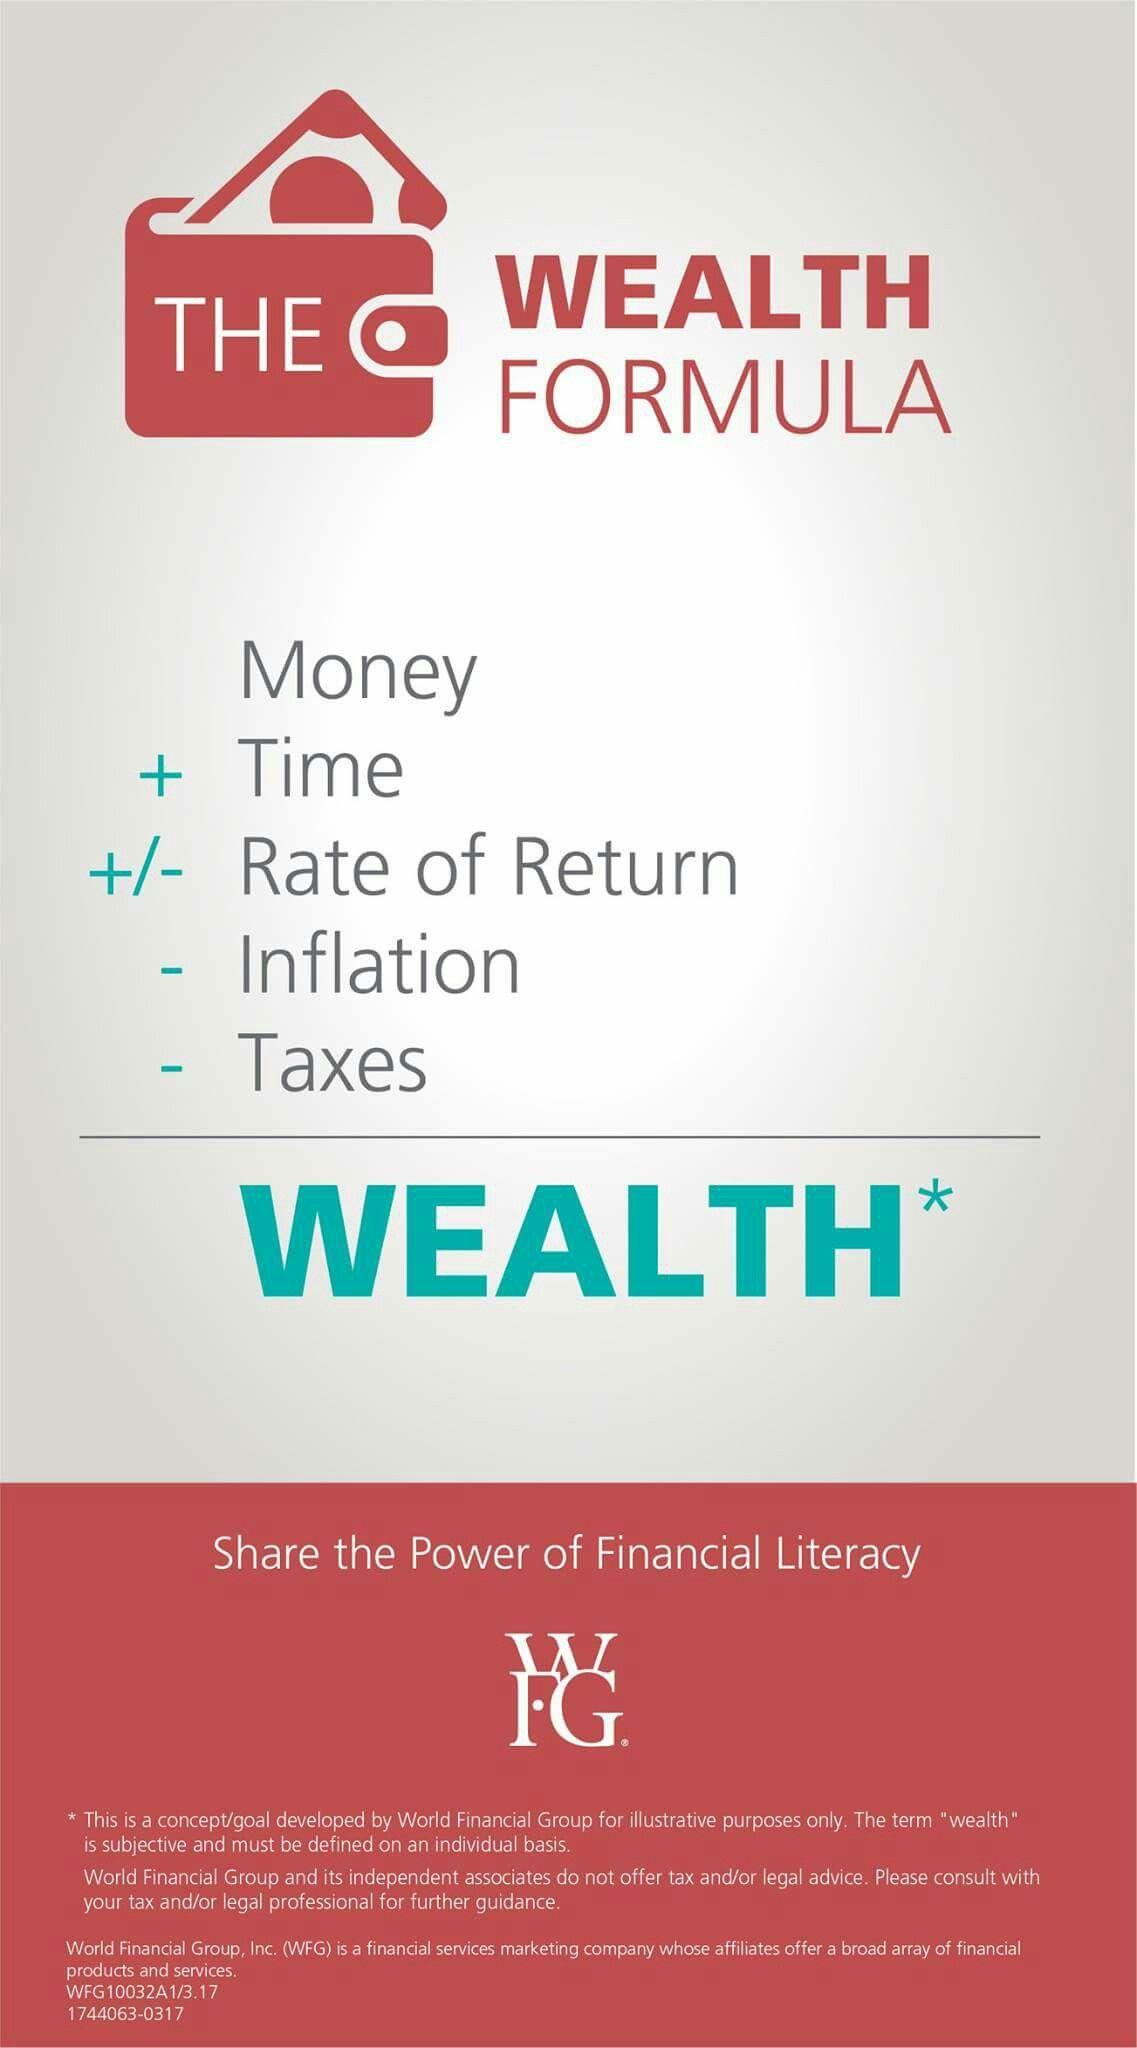 Pin By Darsh Gupta On Lic Financial Literacy Finance Financial